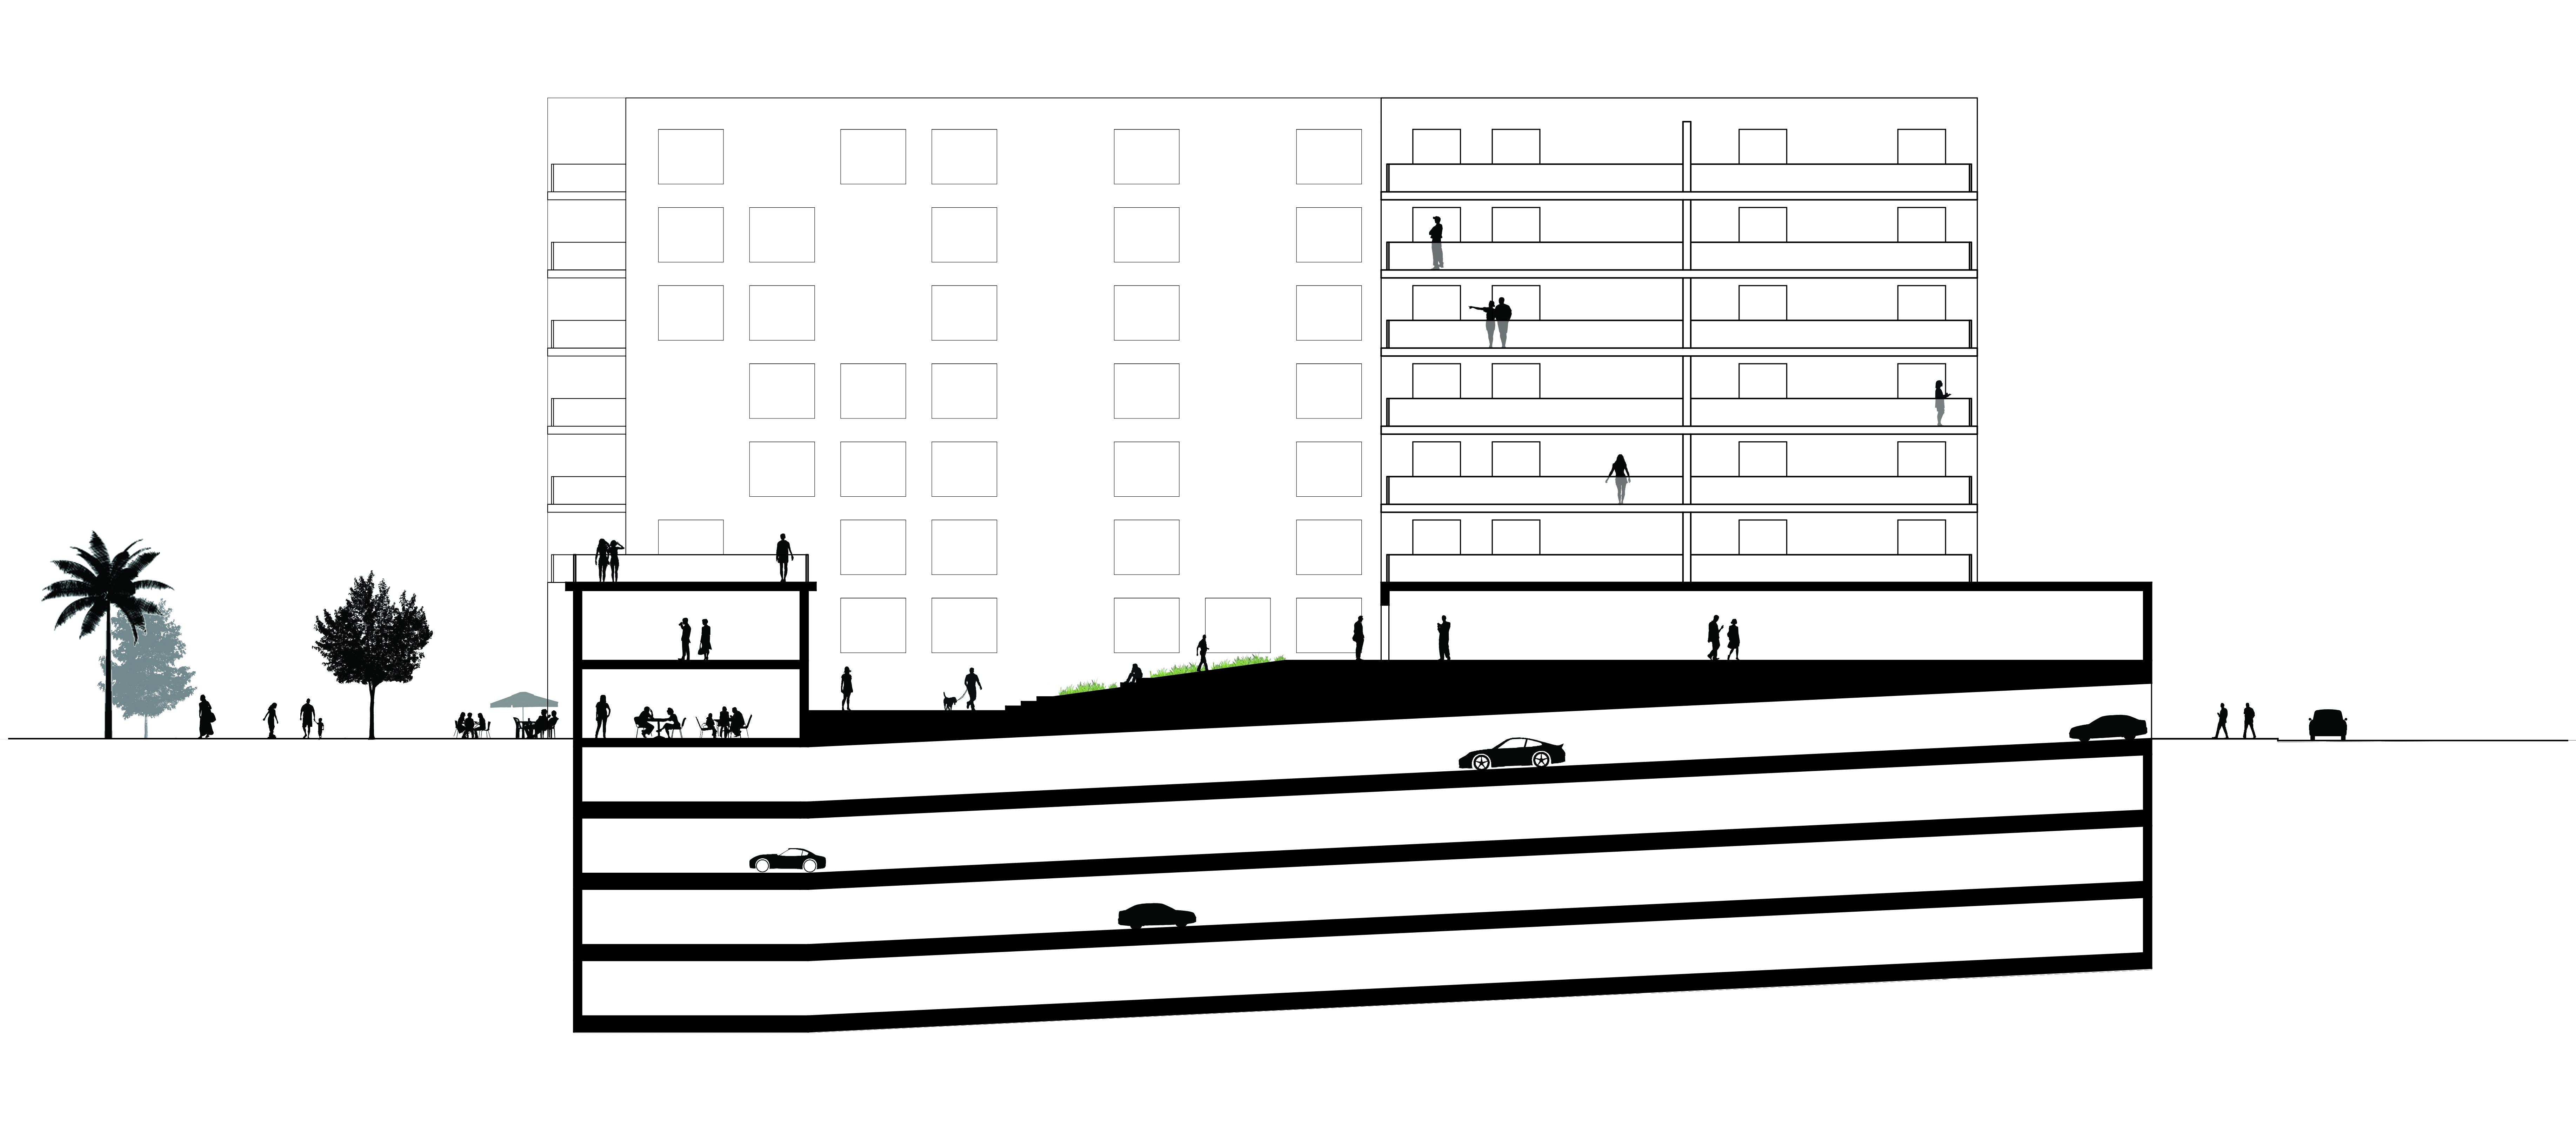 Pics For Basement Parking Detail Section